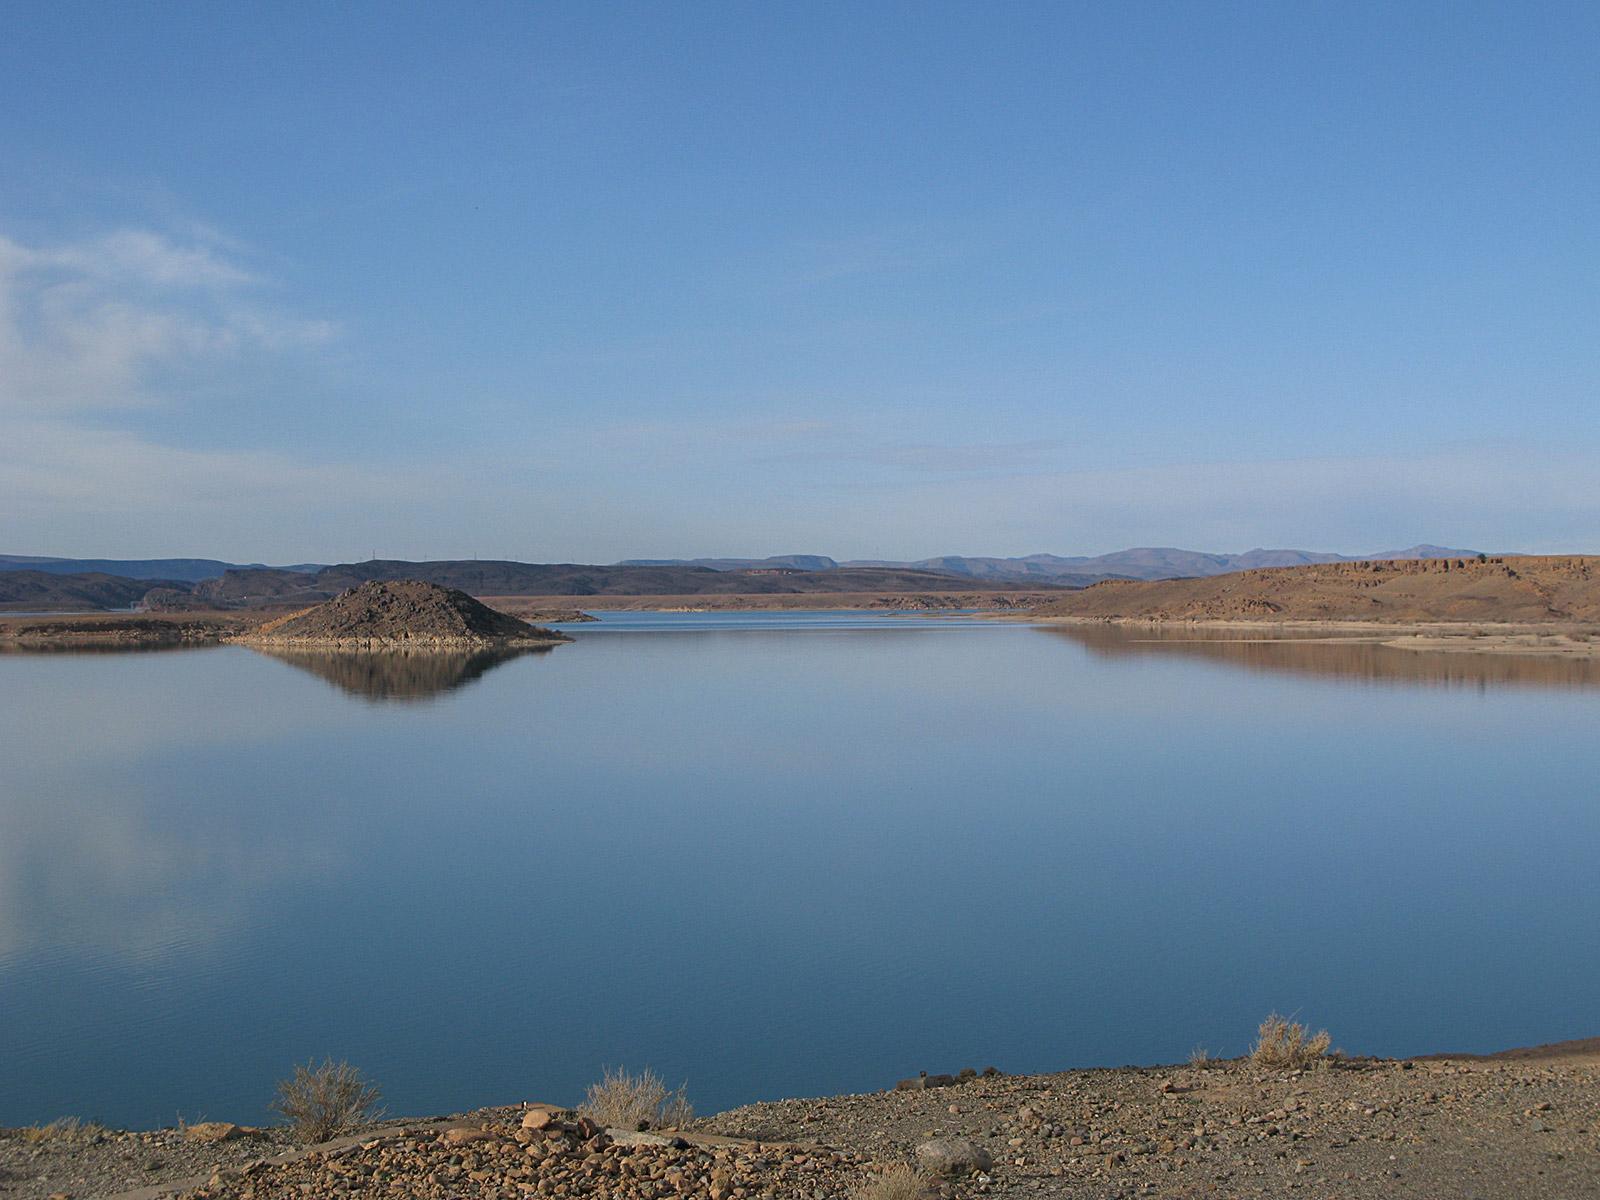 Reservoir Barrage Al Mansour Ad Dahbi